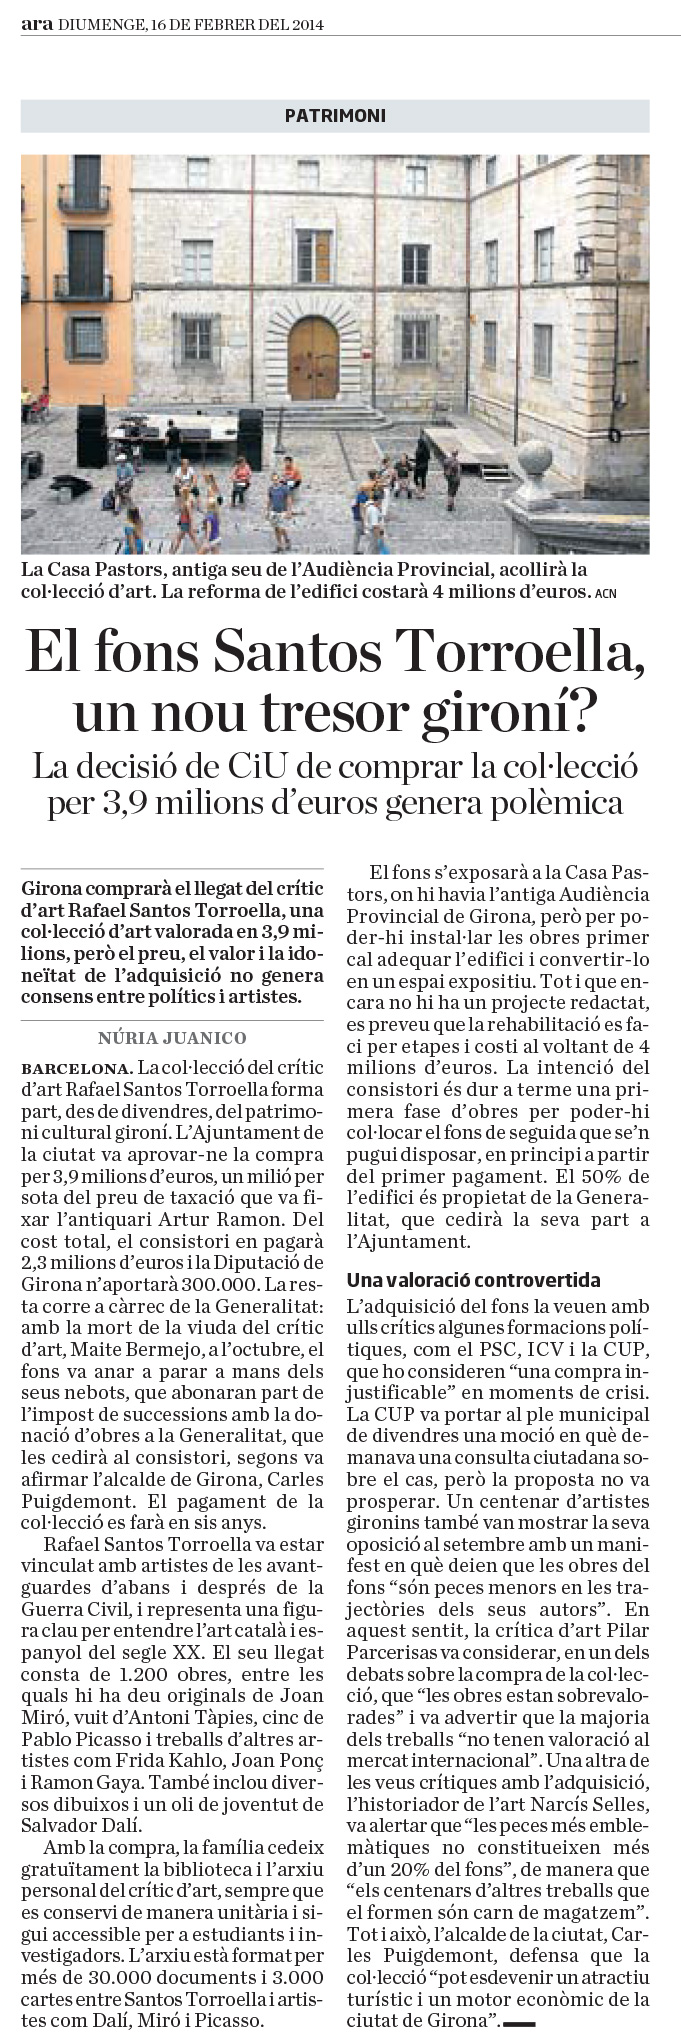 El fons Santos Torroella, un nou tresor gironí?